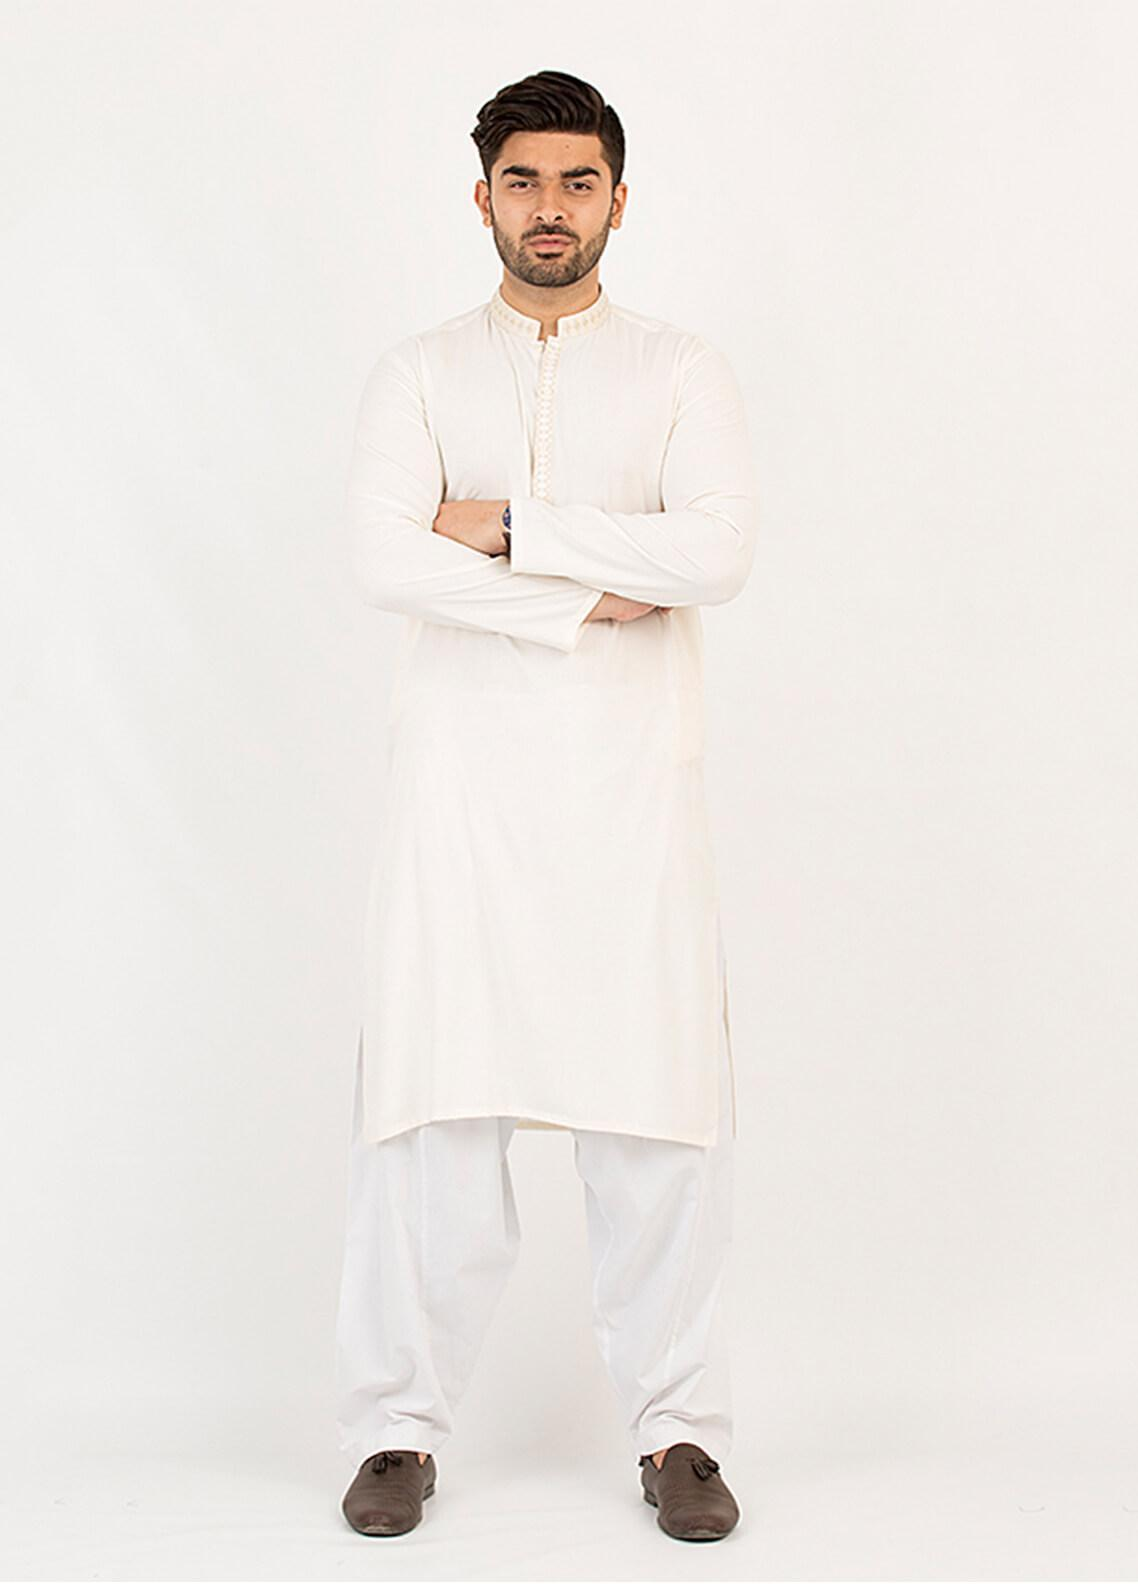 Shahzeb Saeed Wash N Wear Formal Kurta for Men - Cream KURTA-94